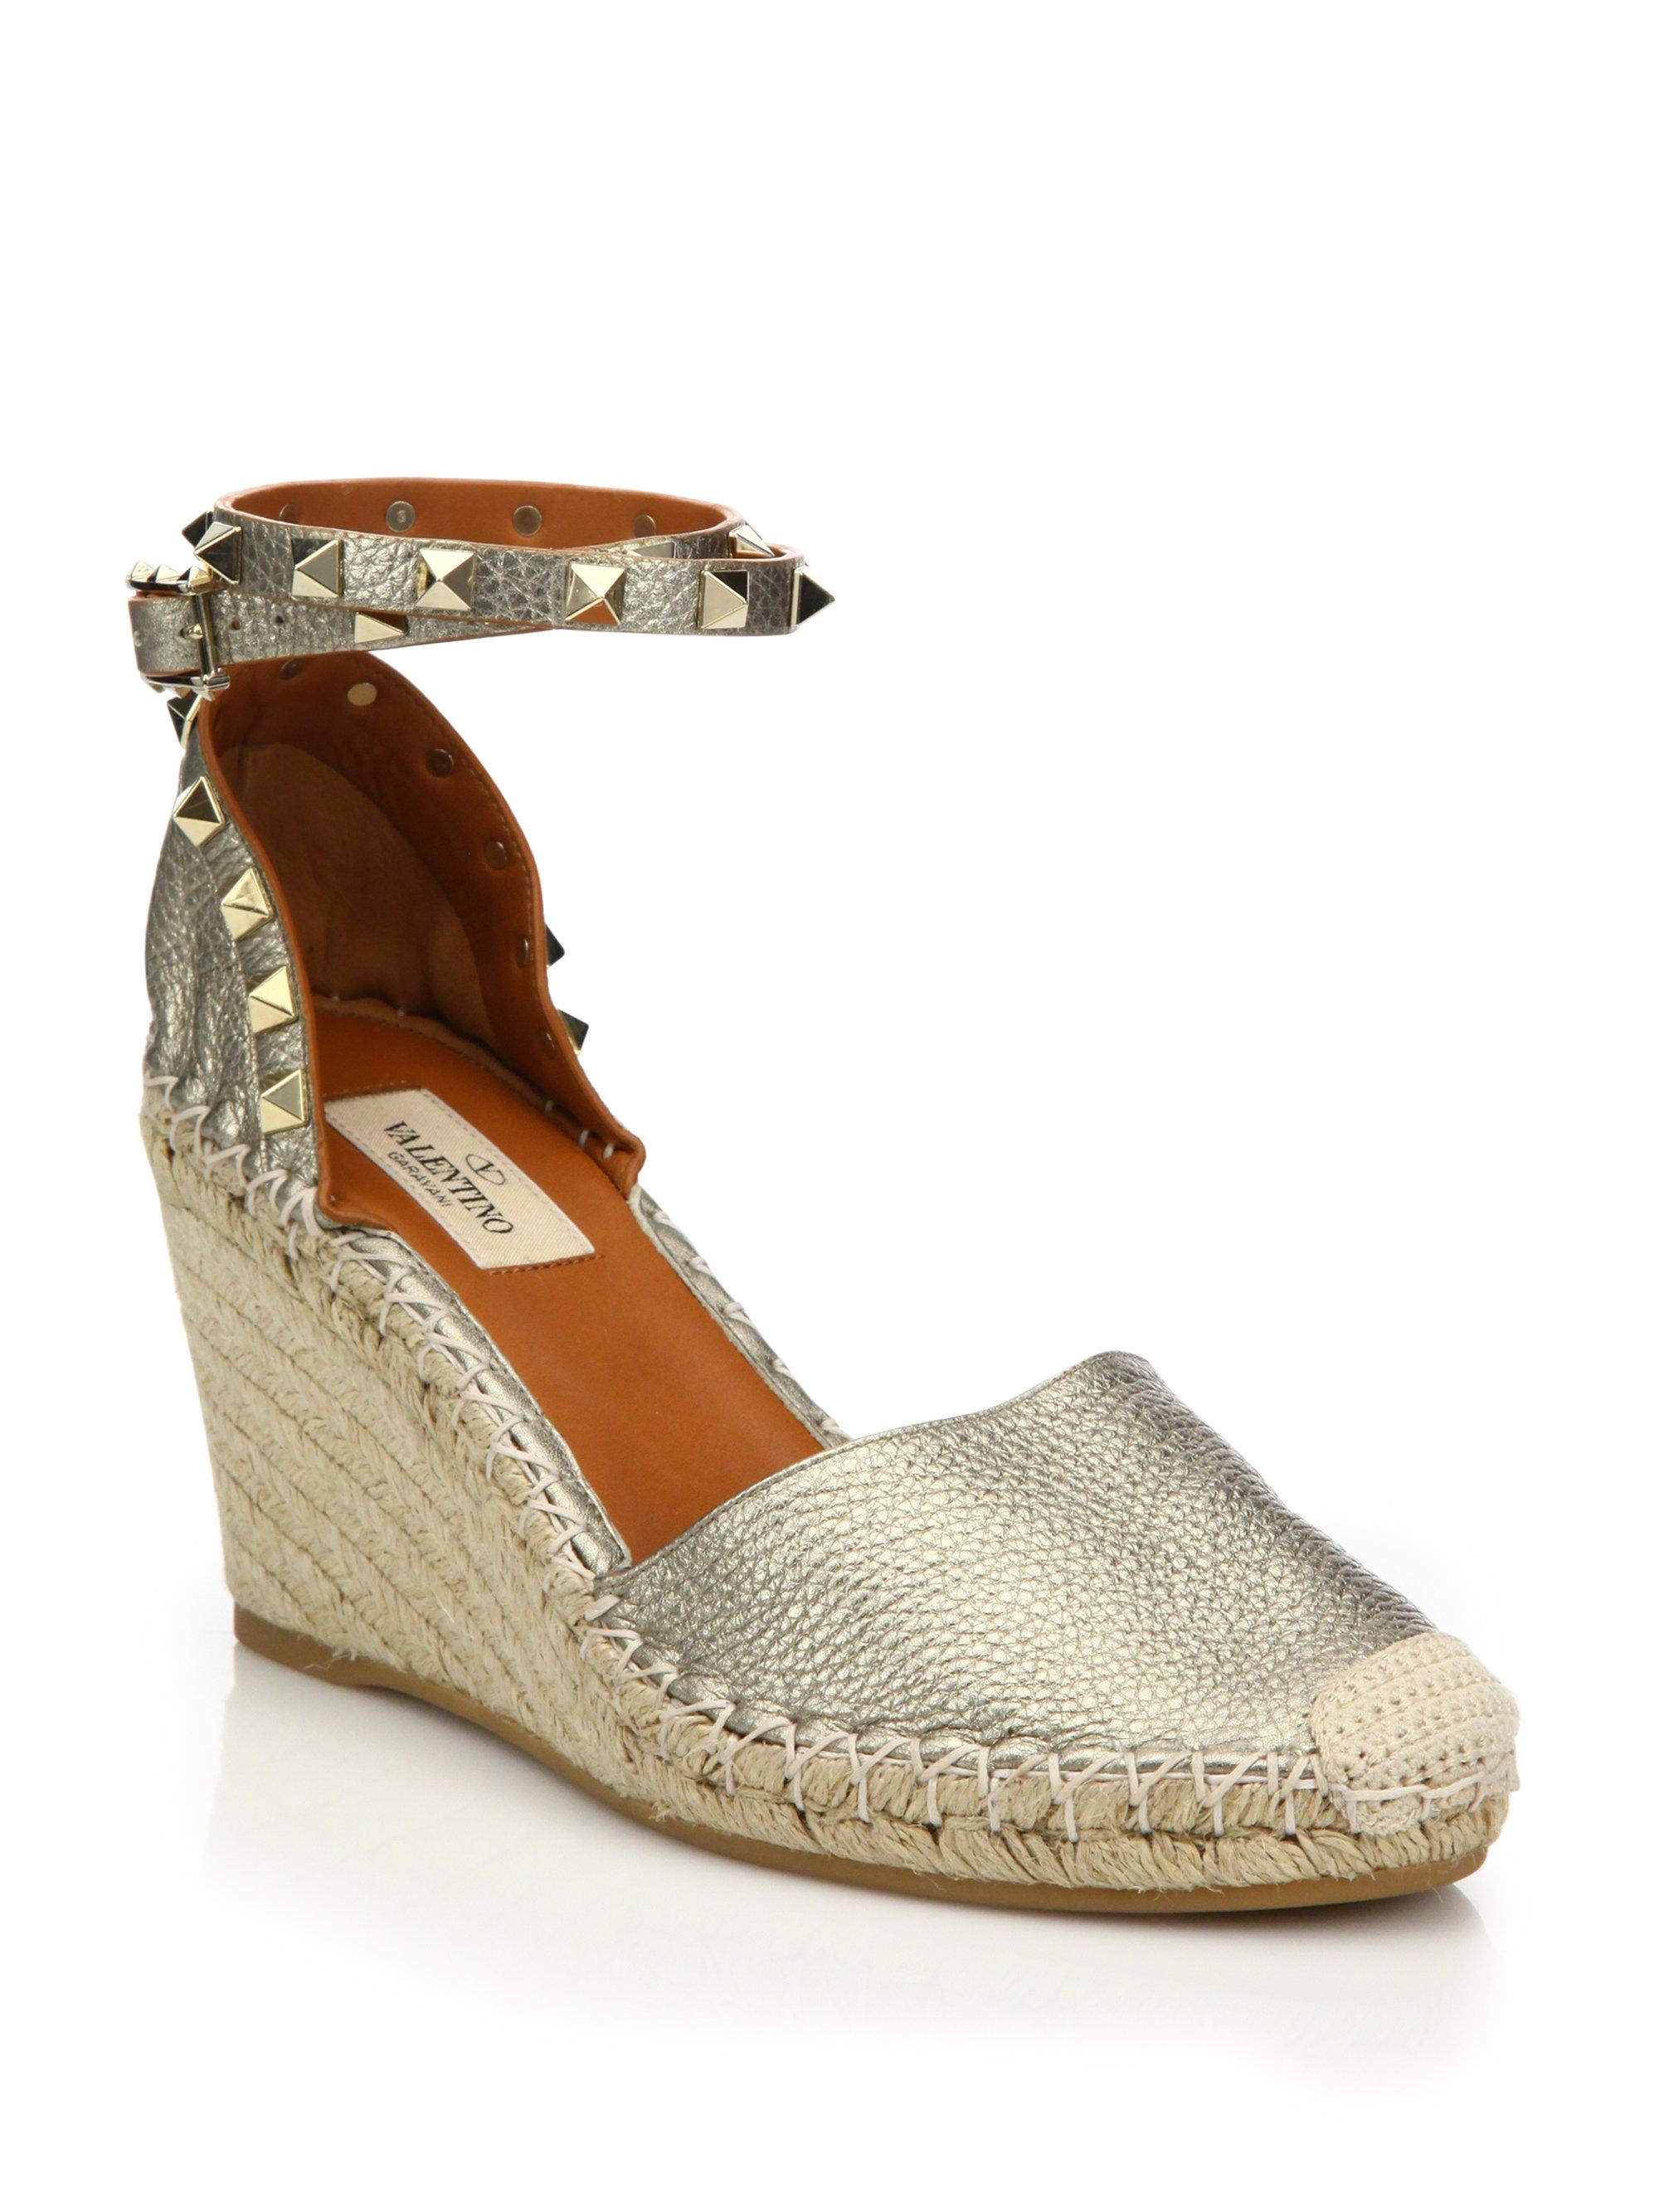 102e758d102 Valentino Rockstud Metallic Leather Espadrille Wedge Sandals